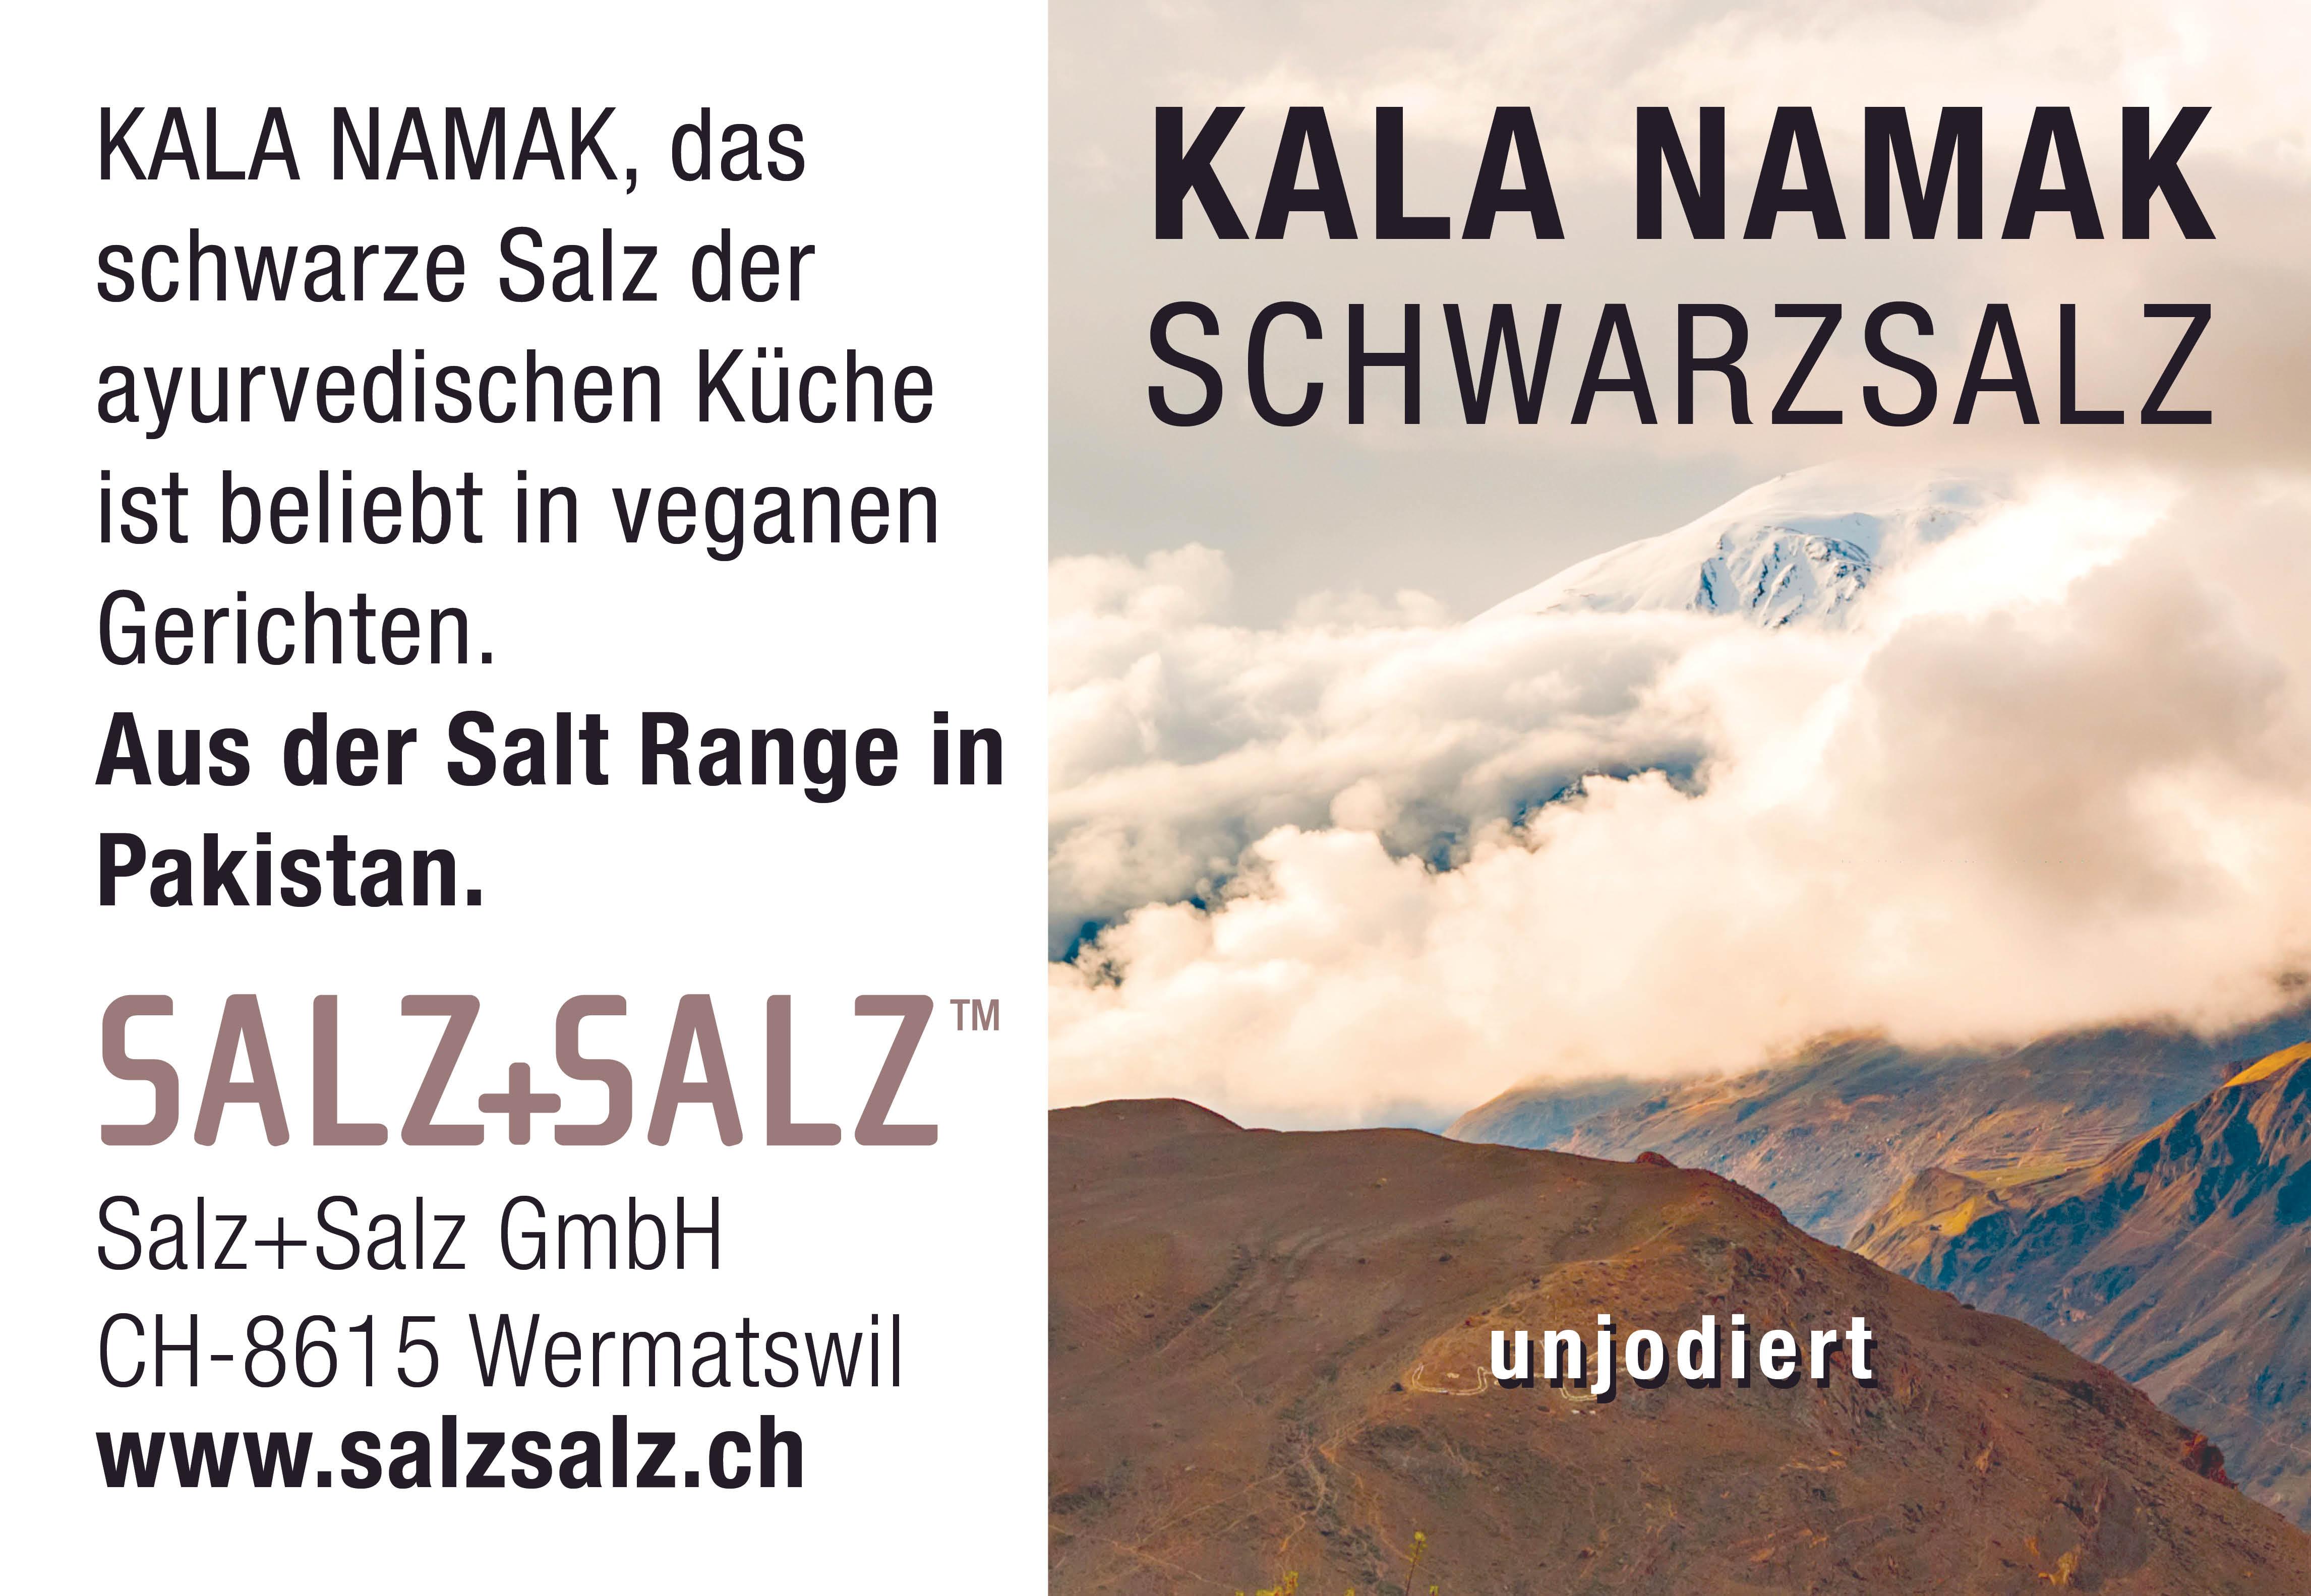 Etikette Kala Namak Salzmühle